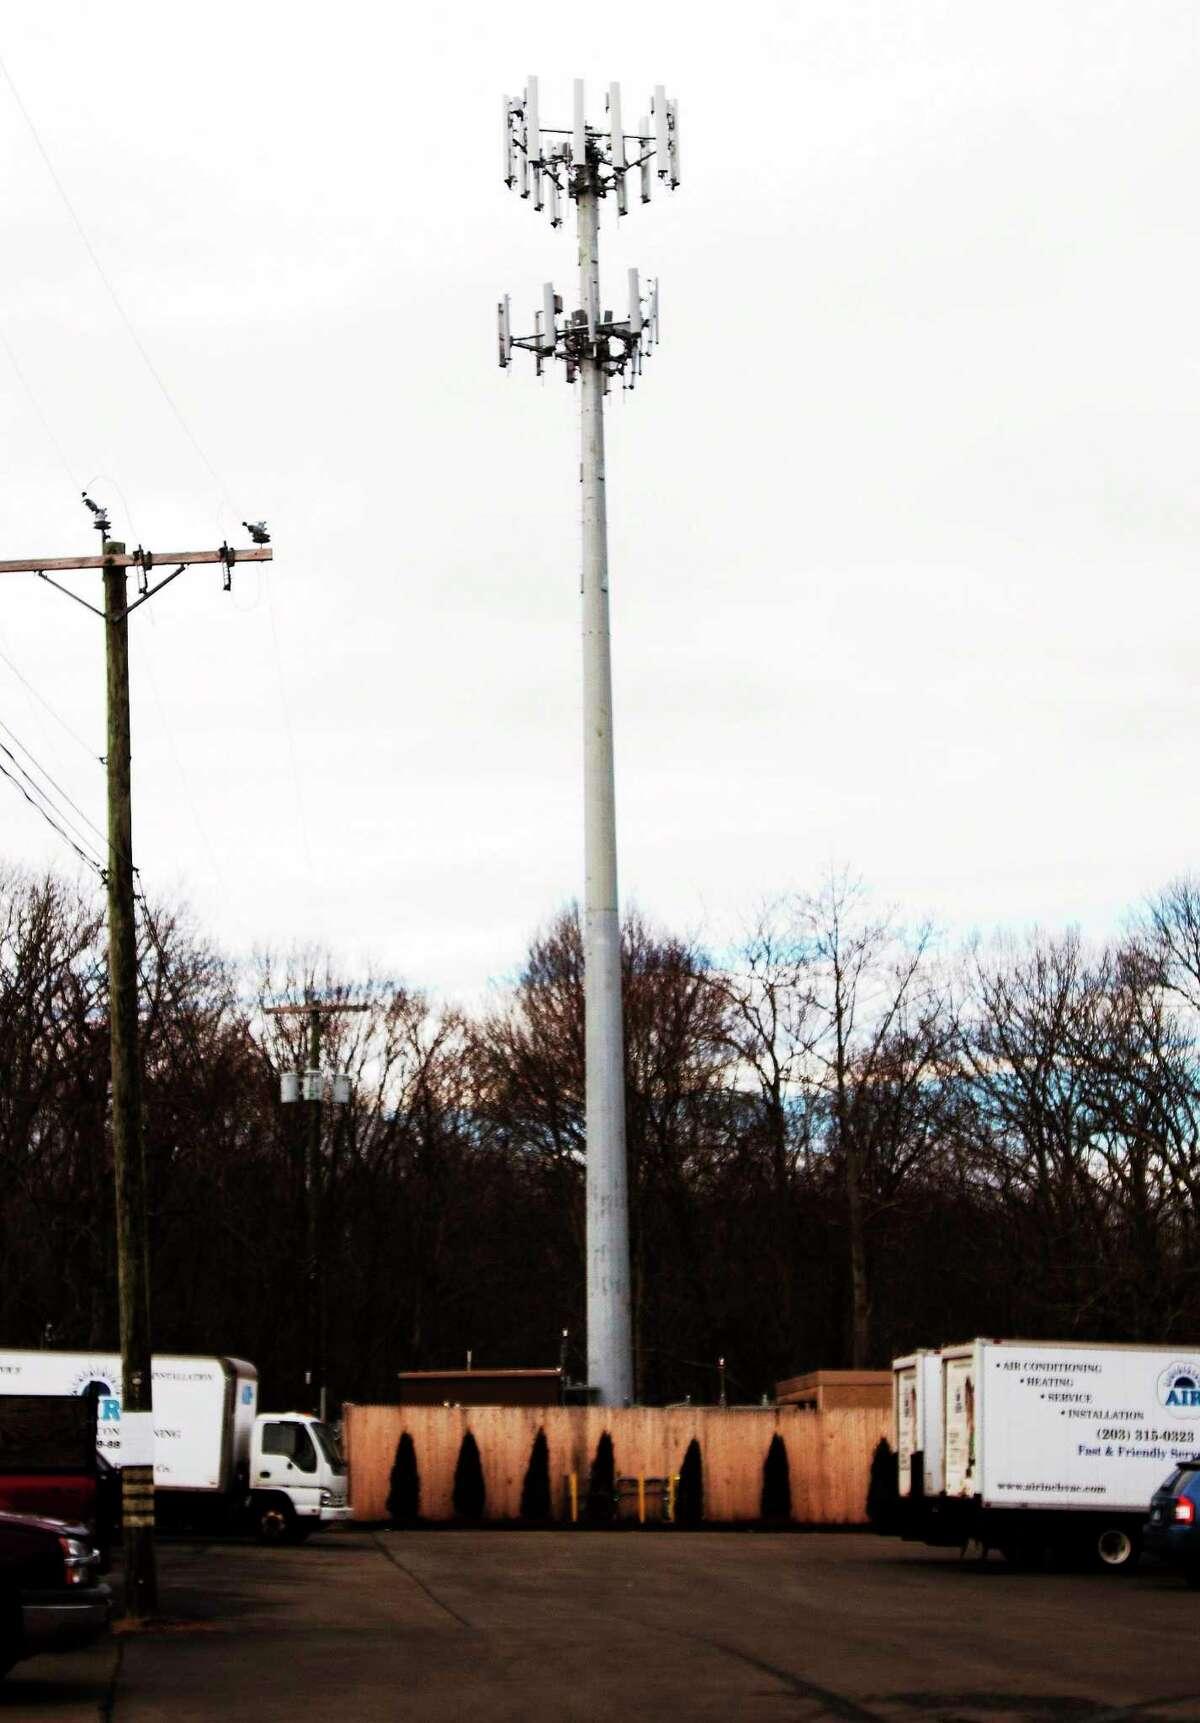 (Melanie Stengel — New Haven Register) Cell phone tower off of Short Beach Road in Branford, 12/30.